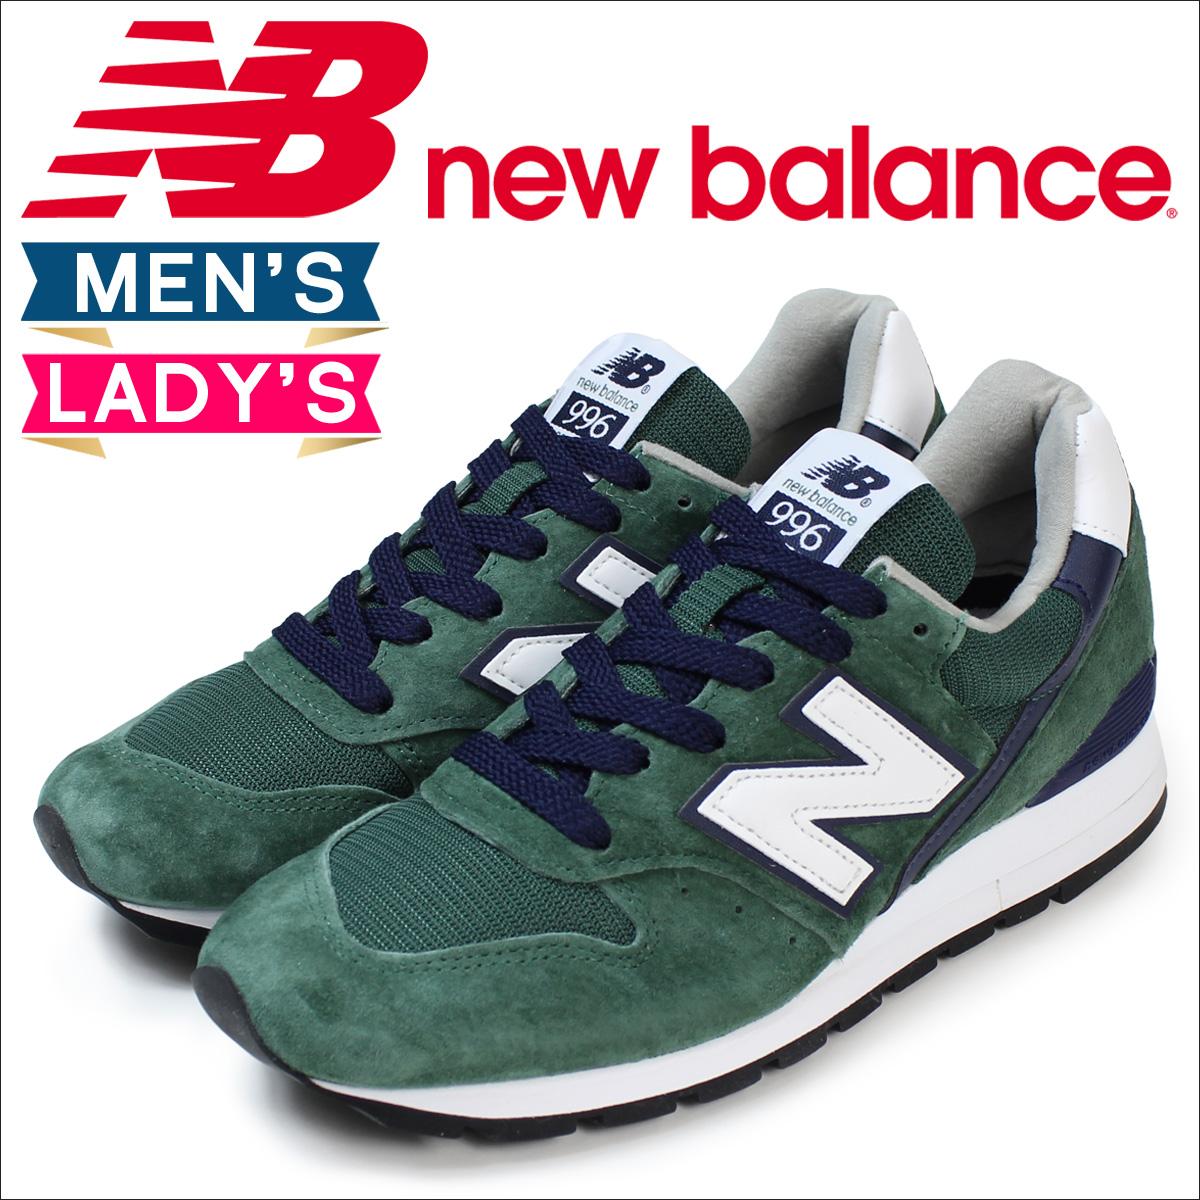 new balance 996 men